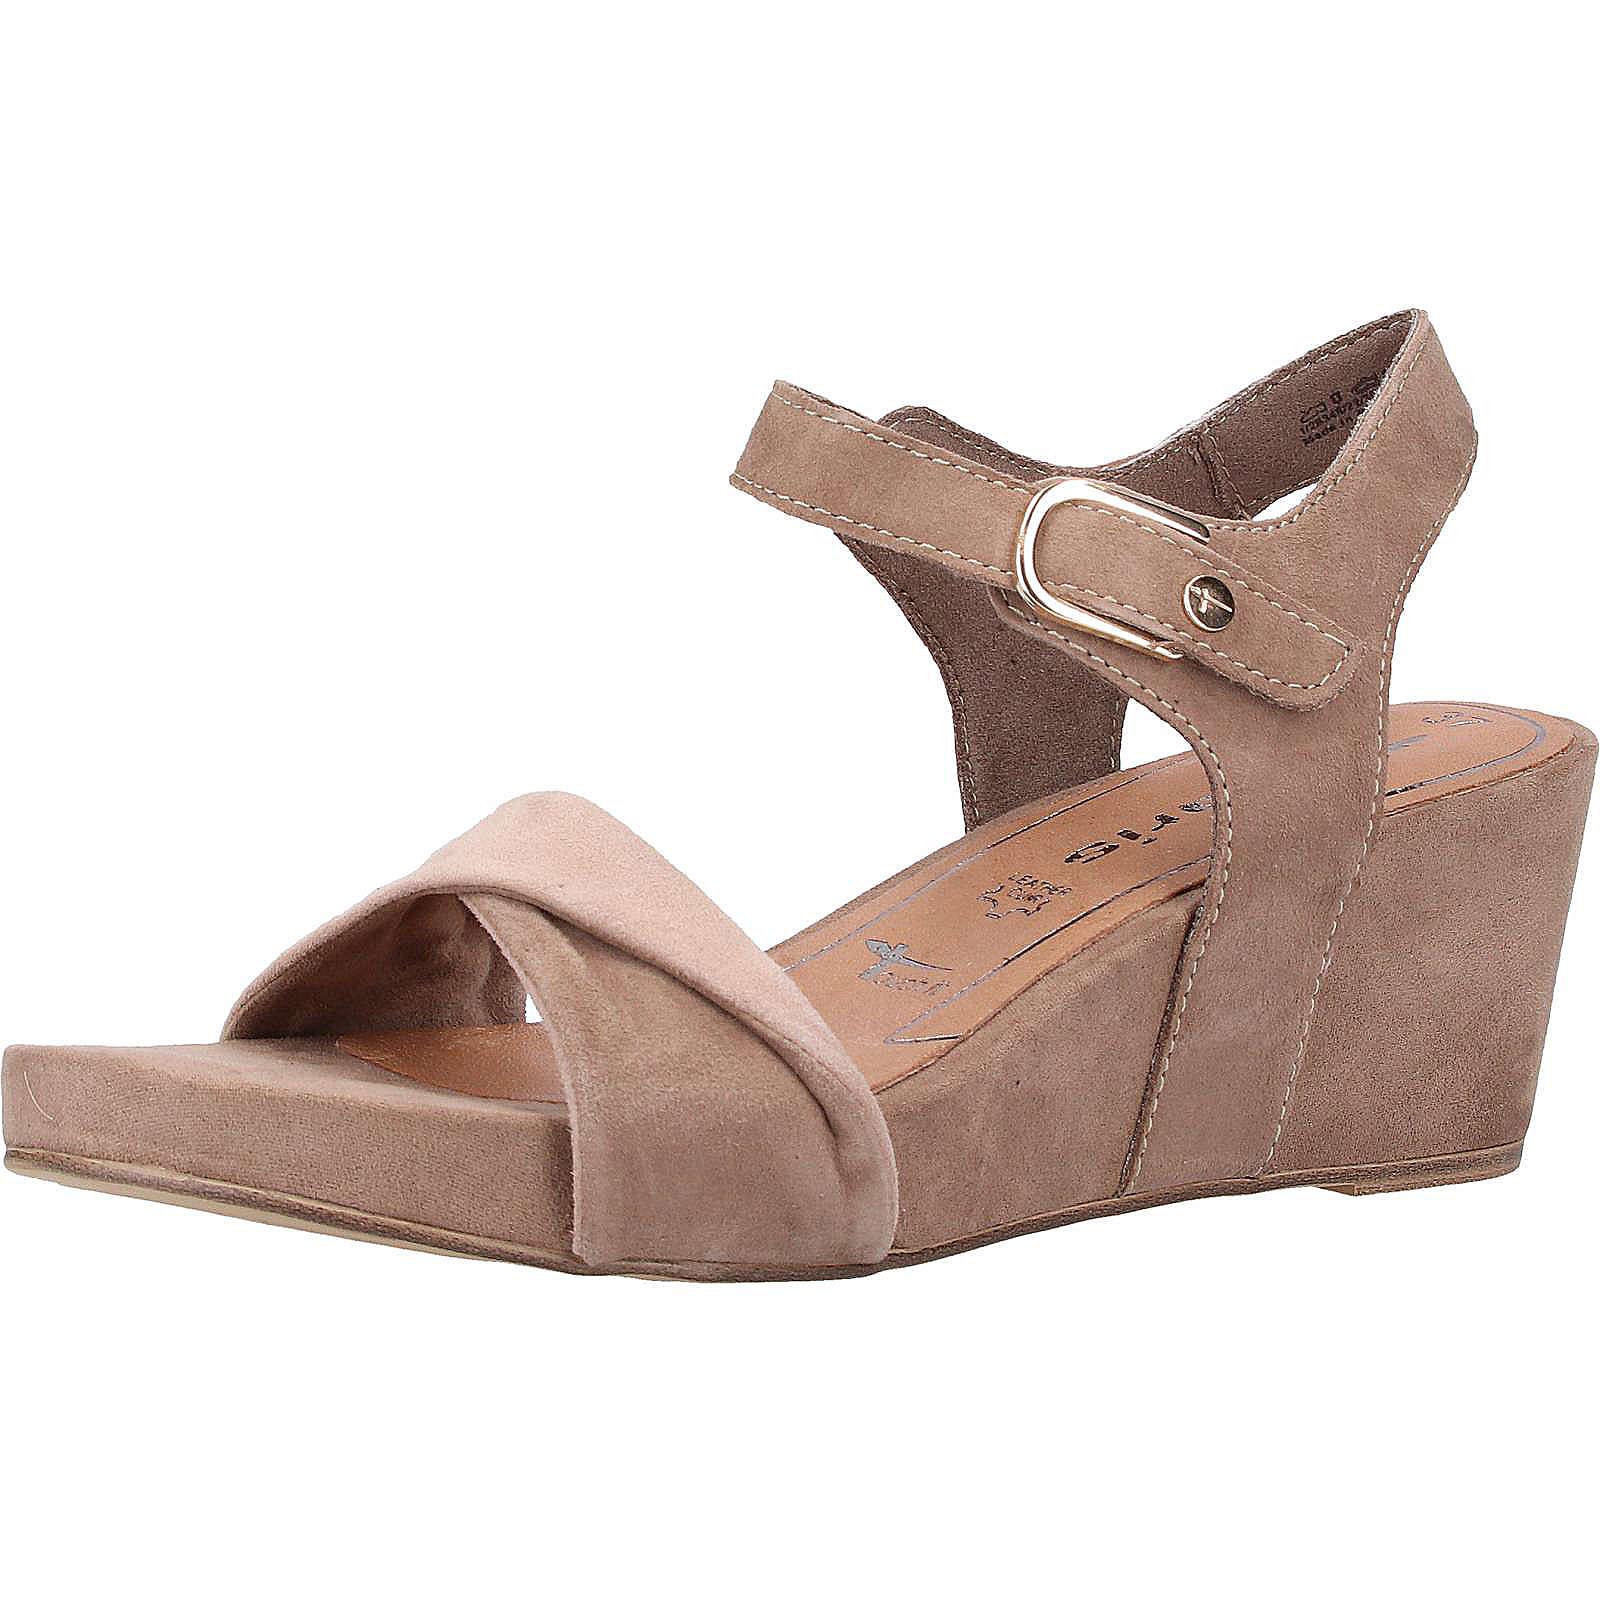 Tamaris Sandalen Klassische Sandaletten grau Damen Gr. 37